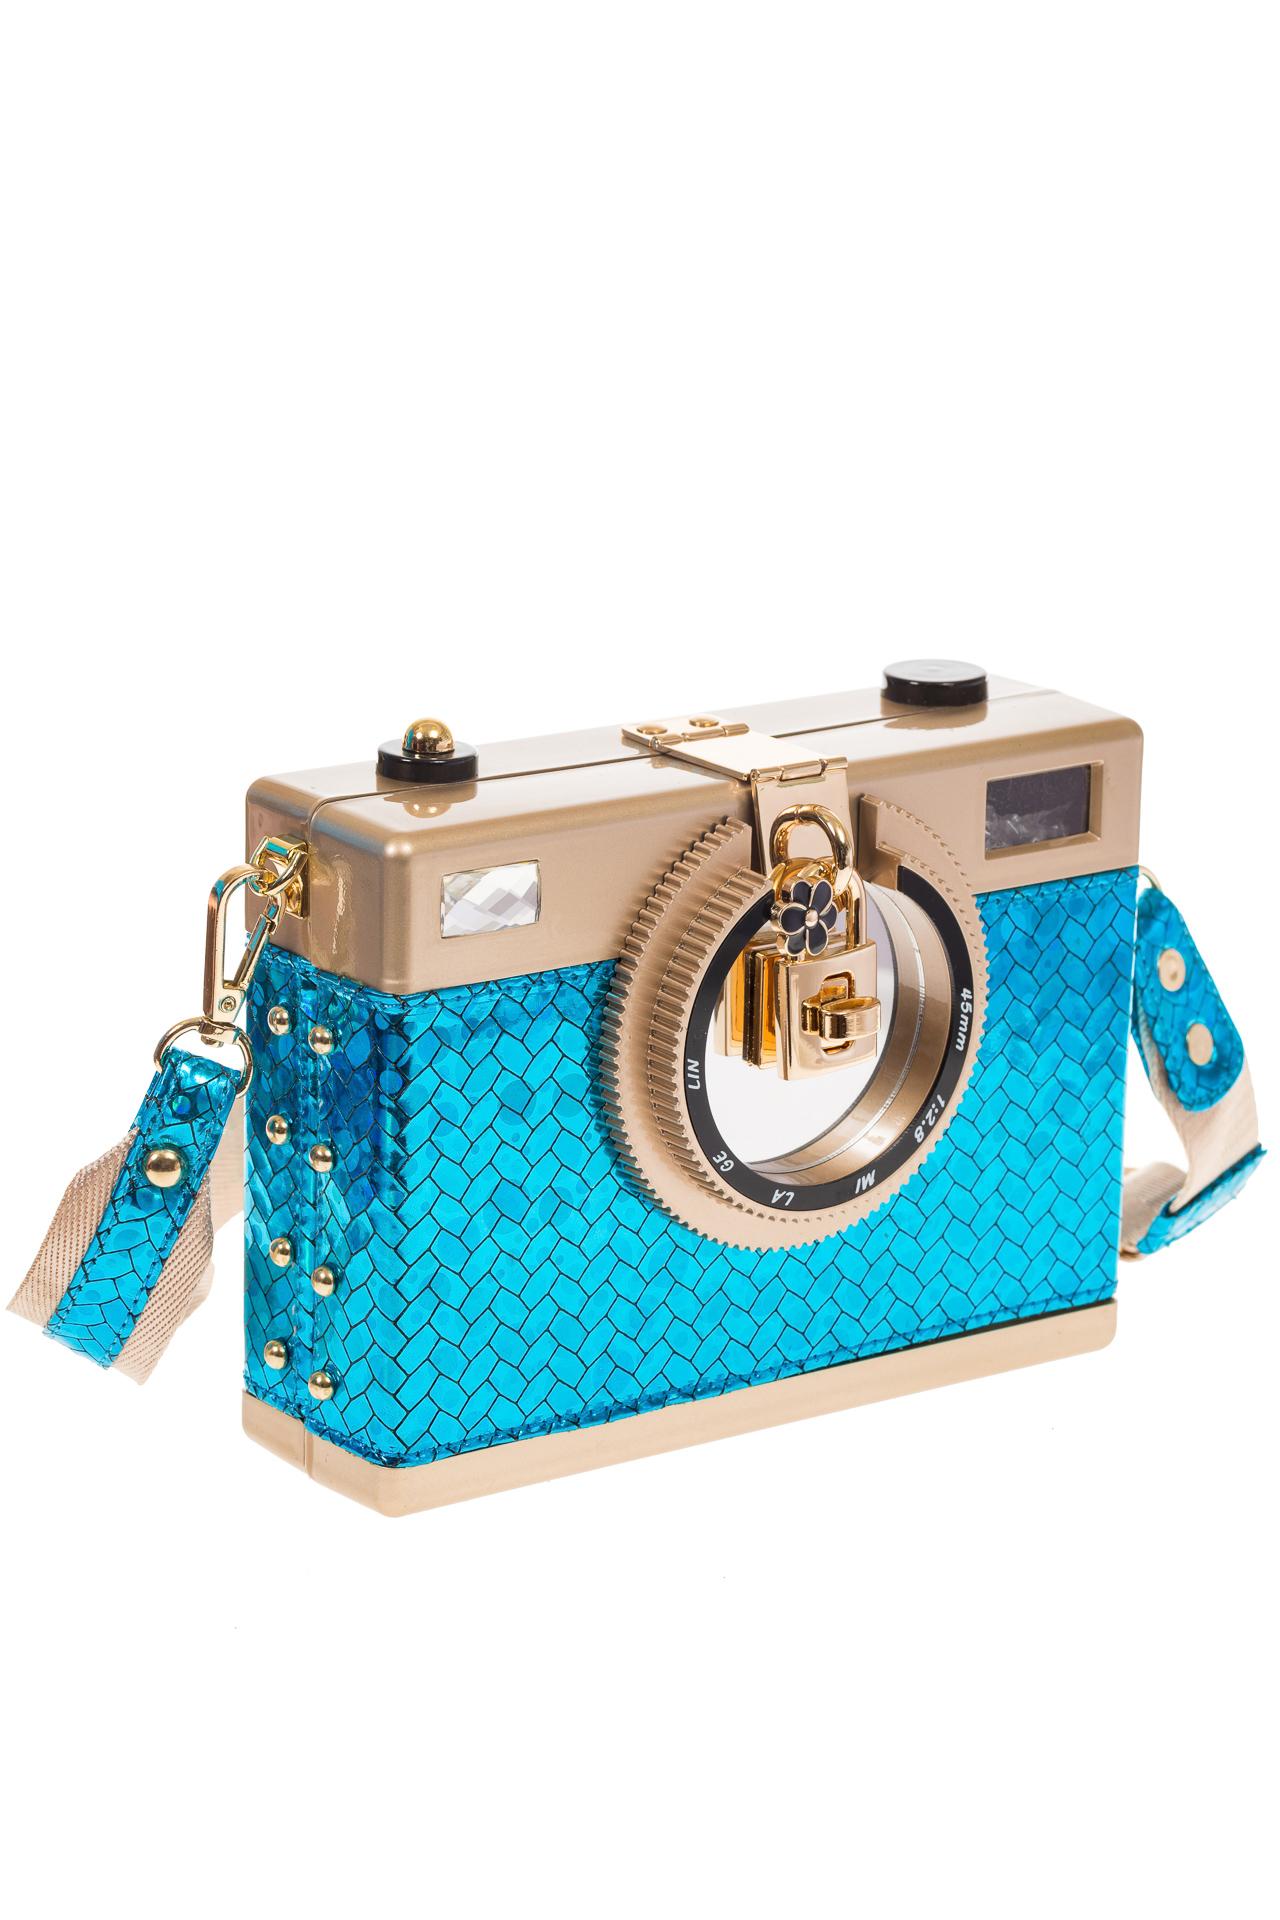 Сумочка-фотоаппарат голубого цвета 2606 для опта